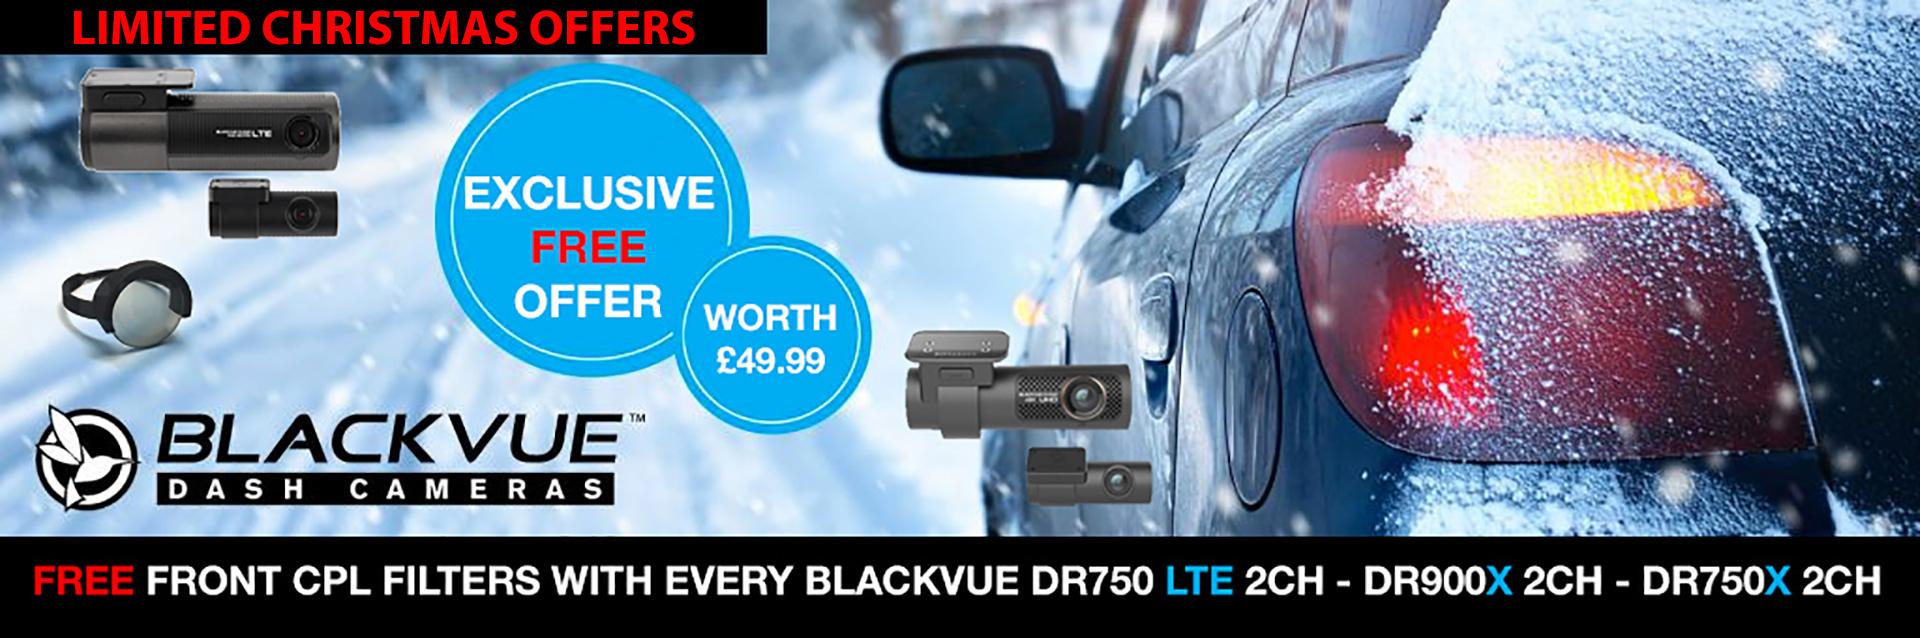 Blackvue UK Sales - Christmas Offers From TTW